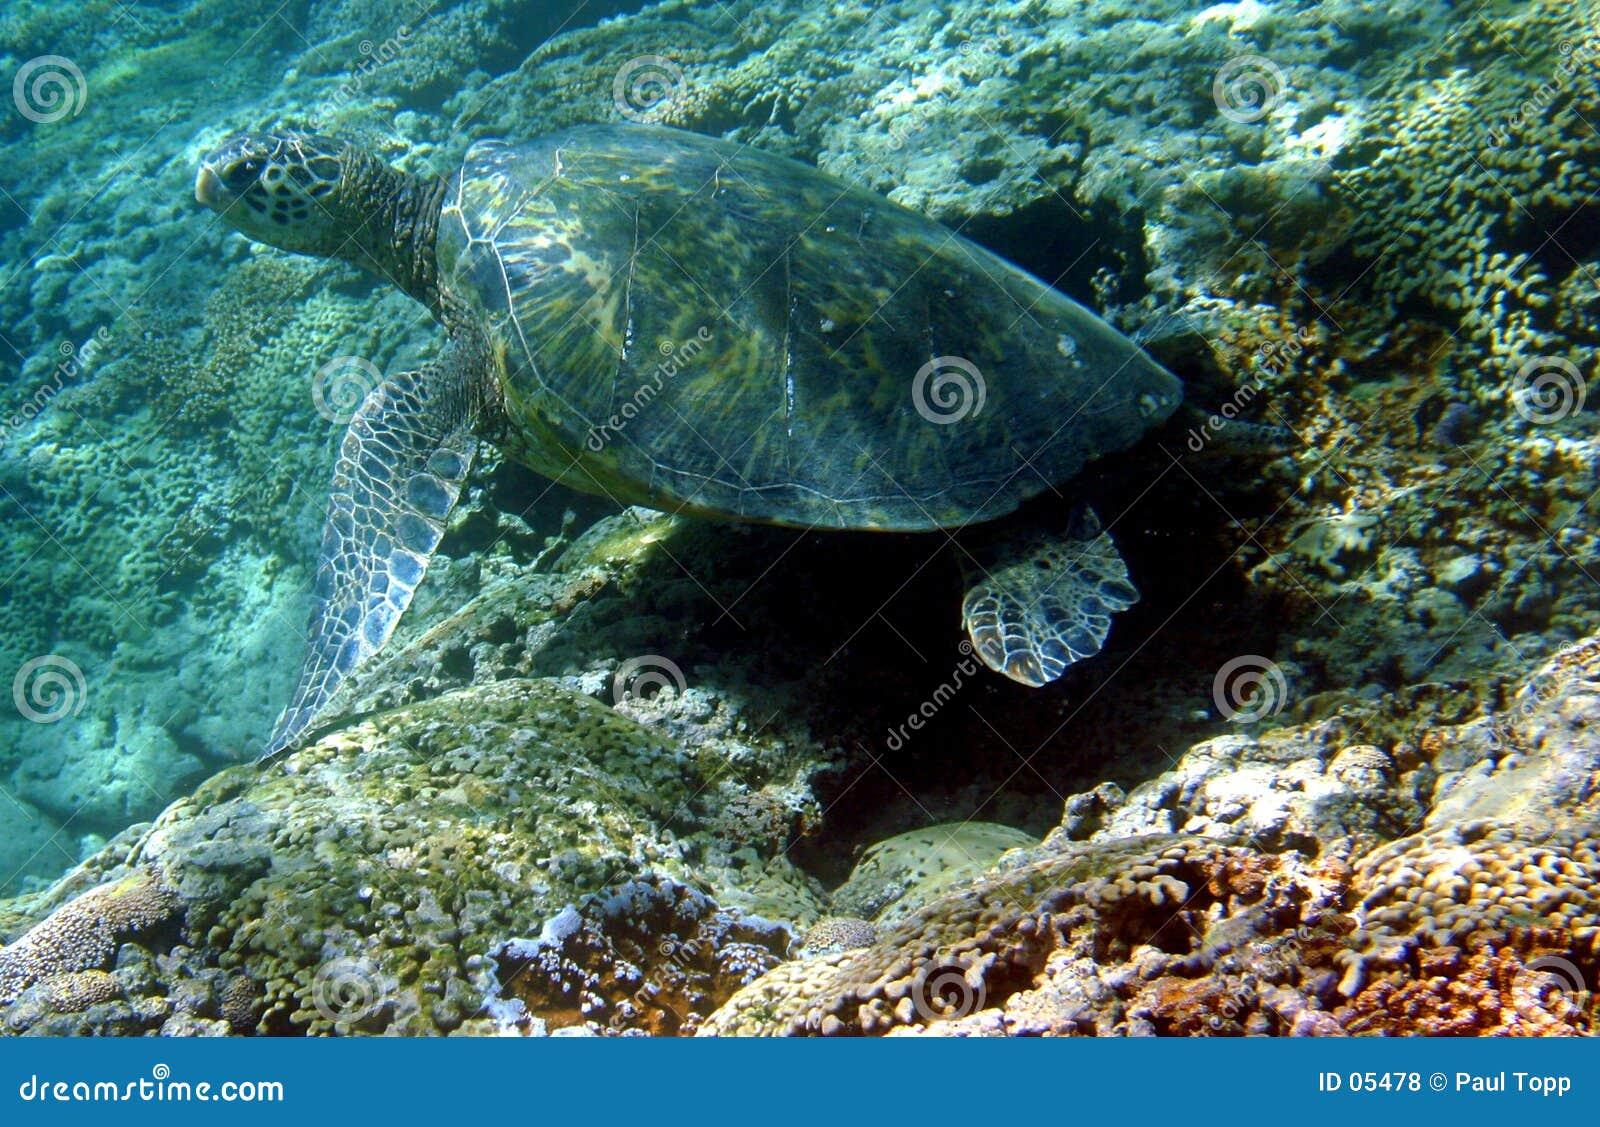 Photo of a Green Sea Turtle